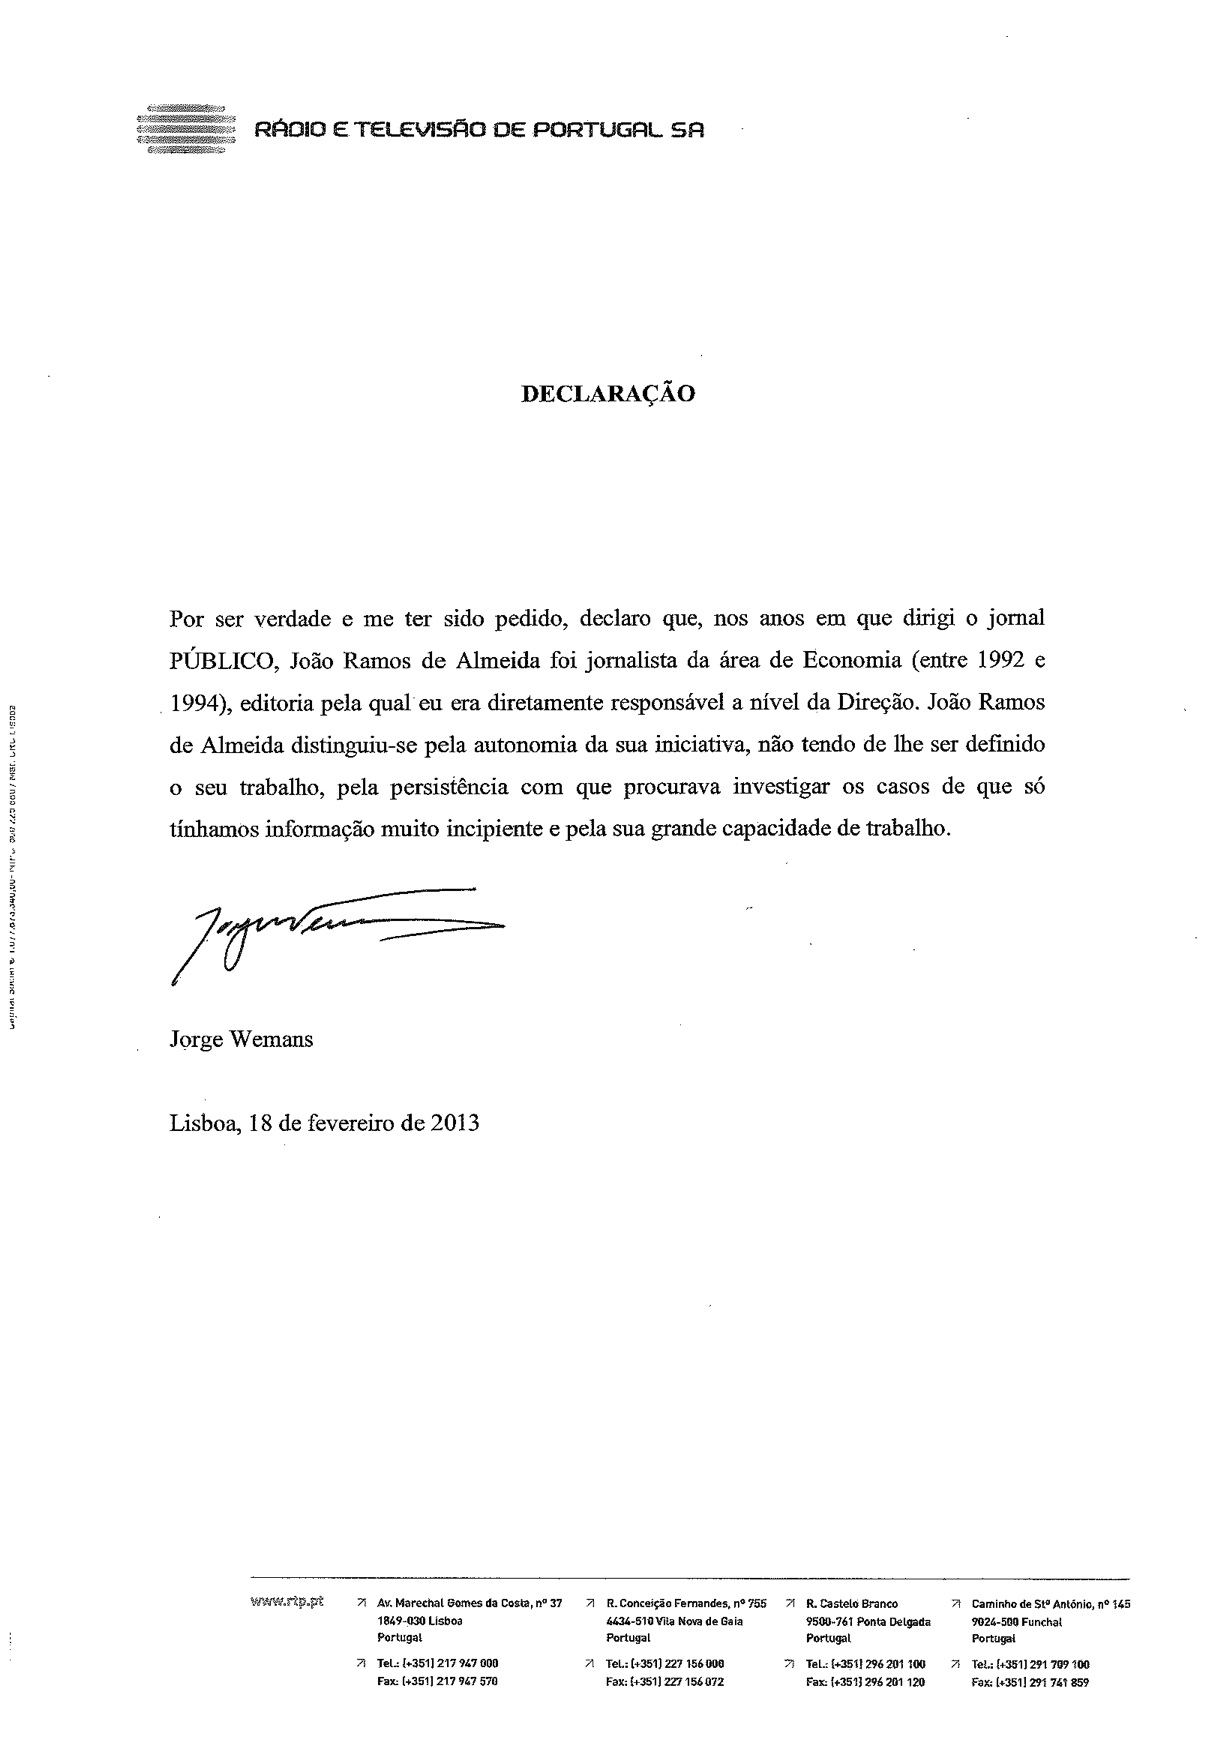 Carta de Jorge Wemans RTP